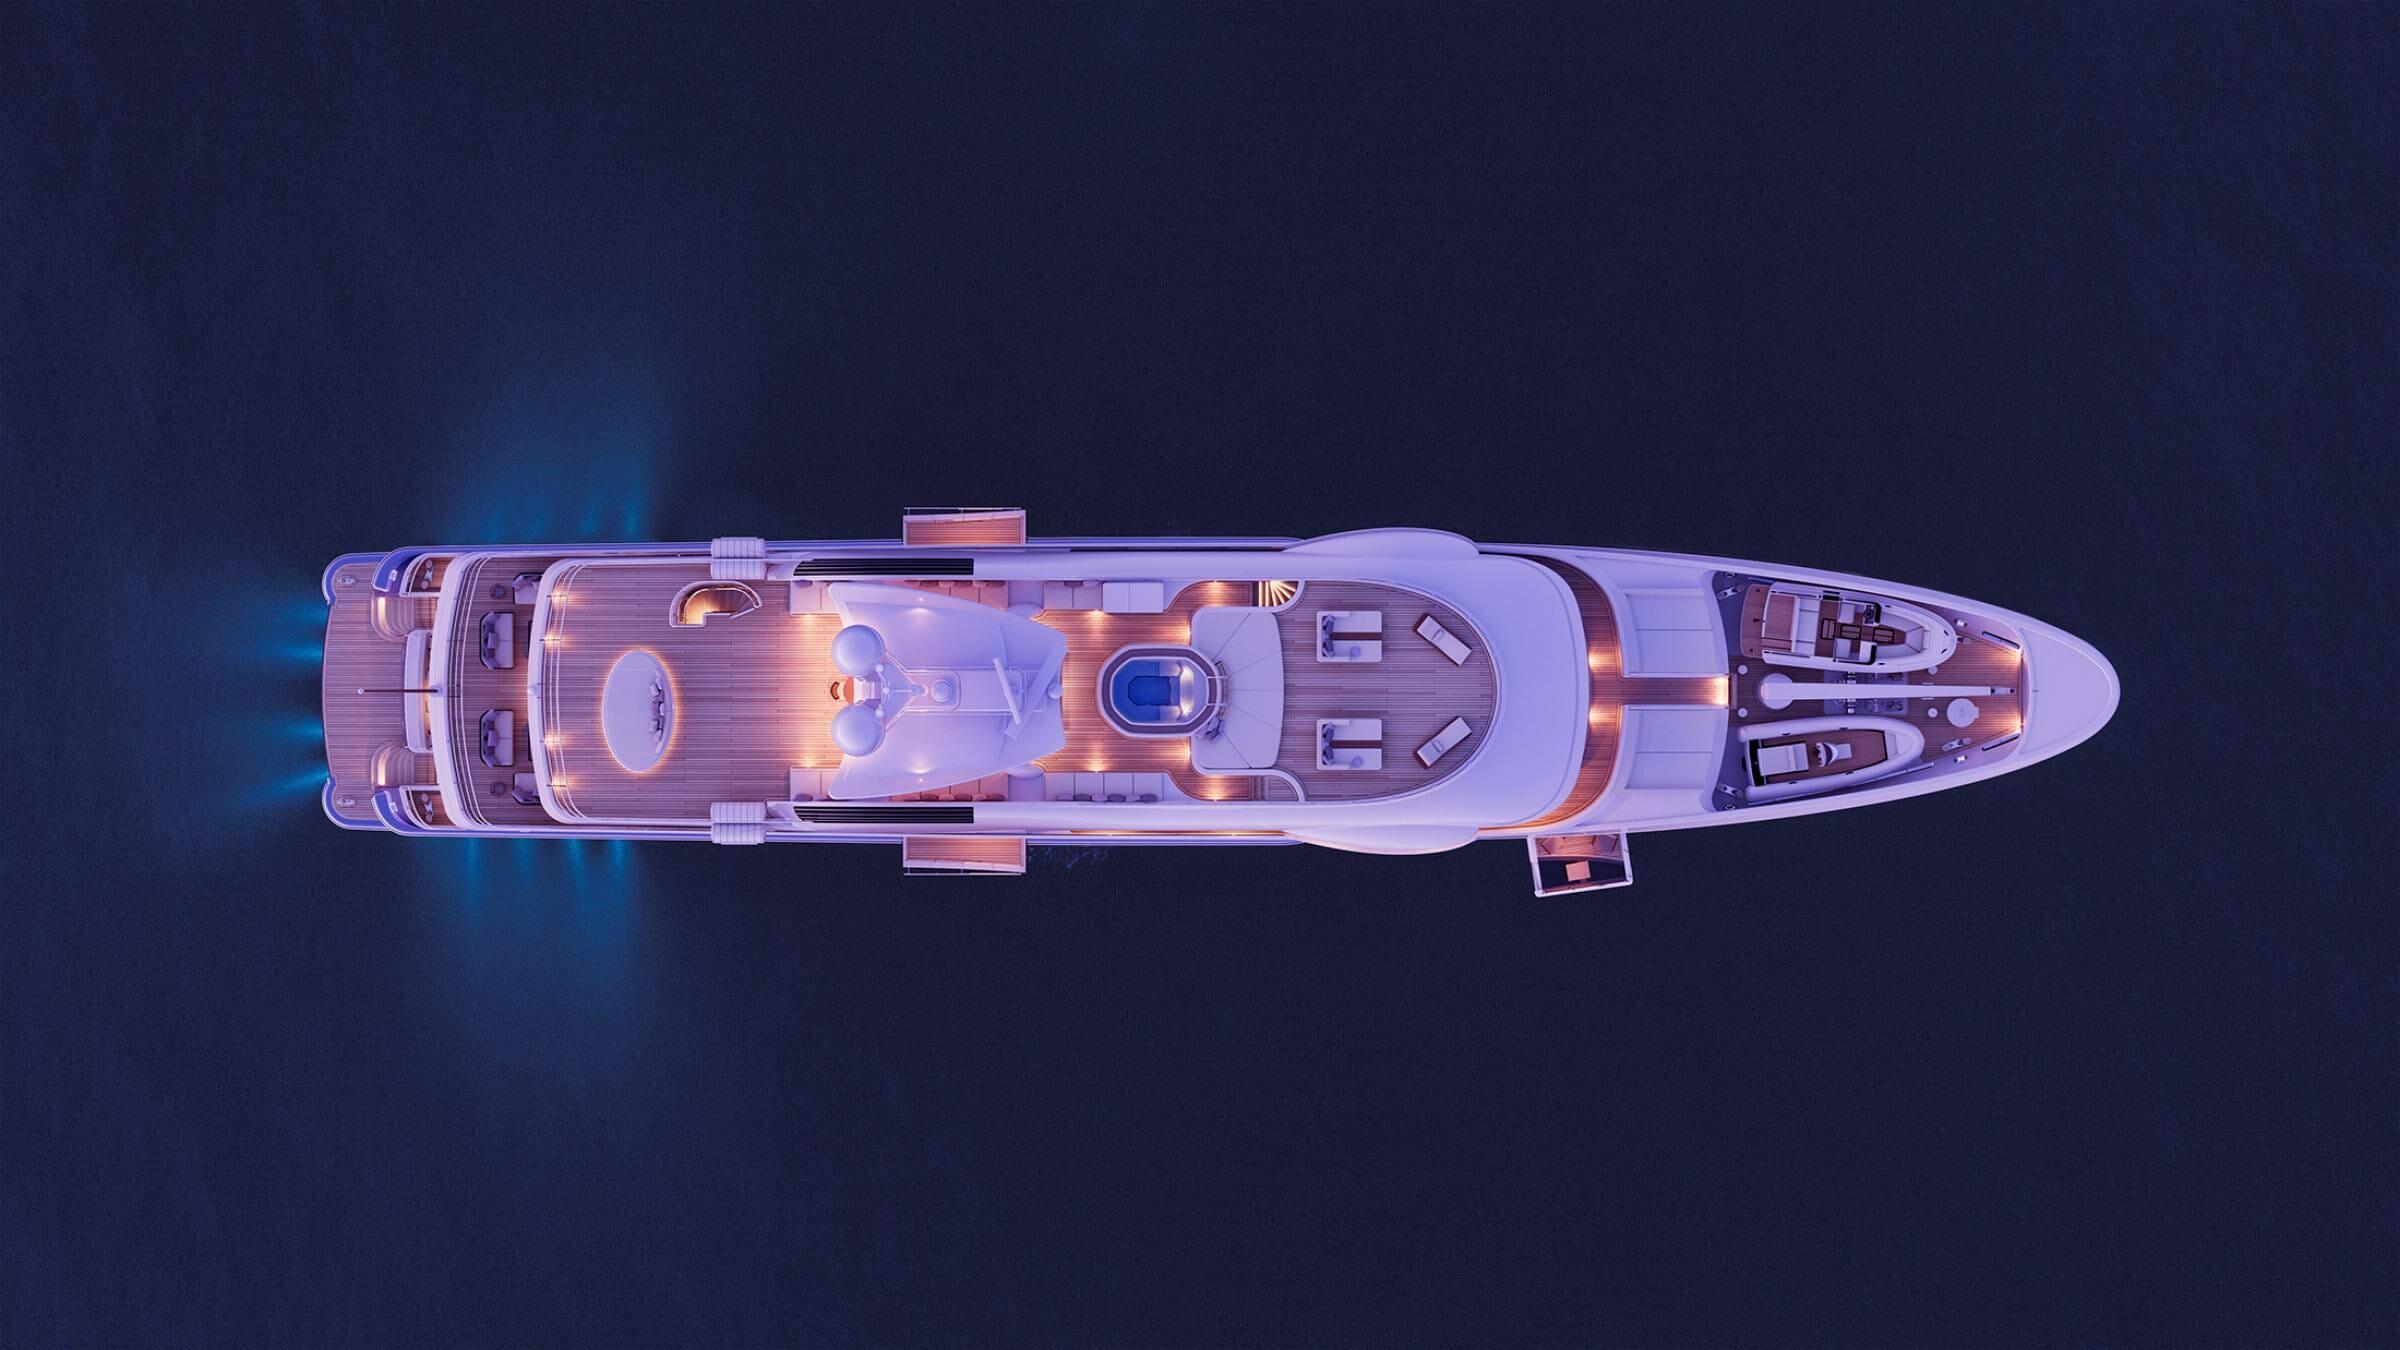 Amels LE180 superyacht Eji